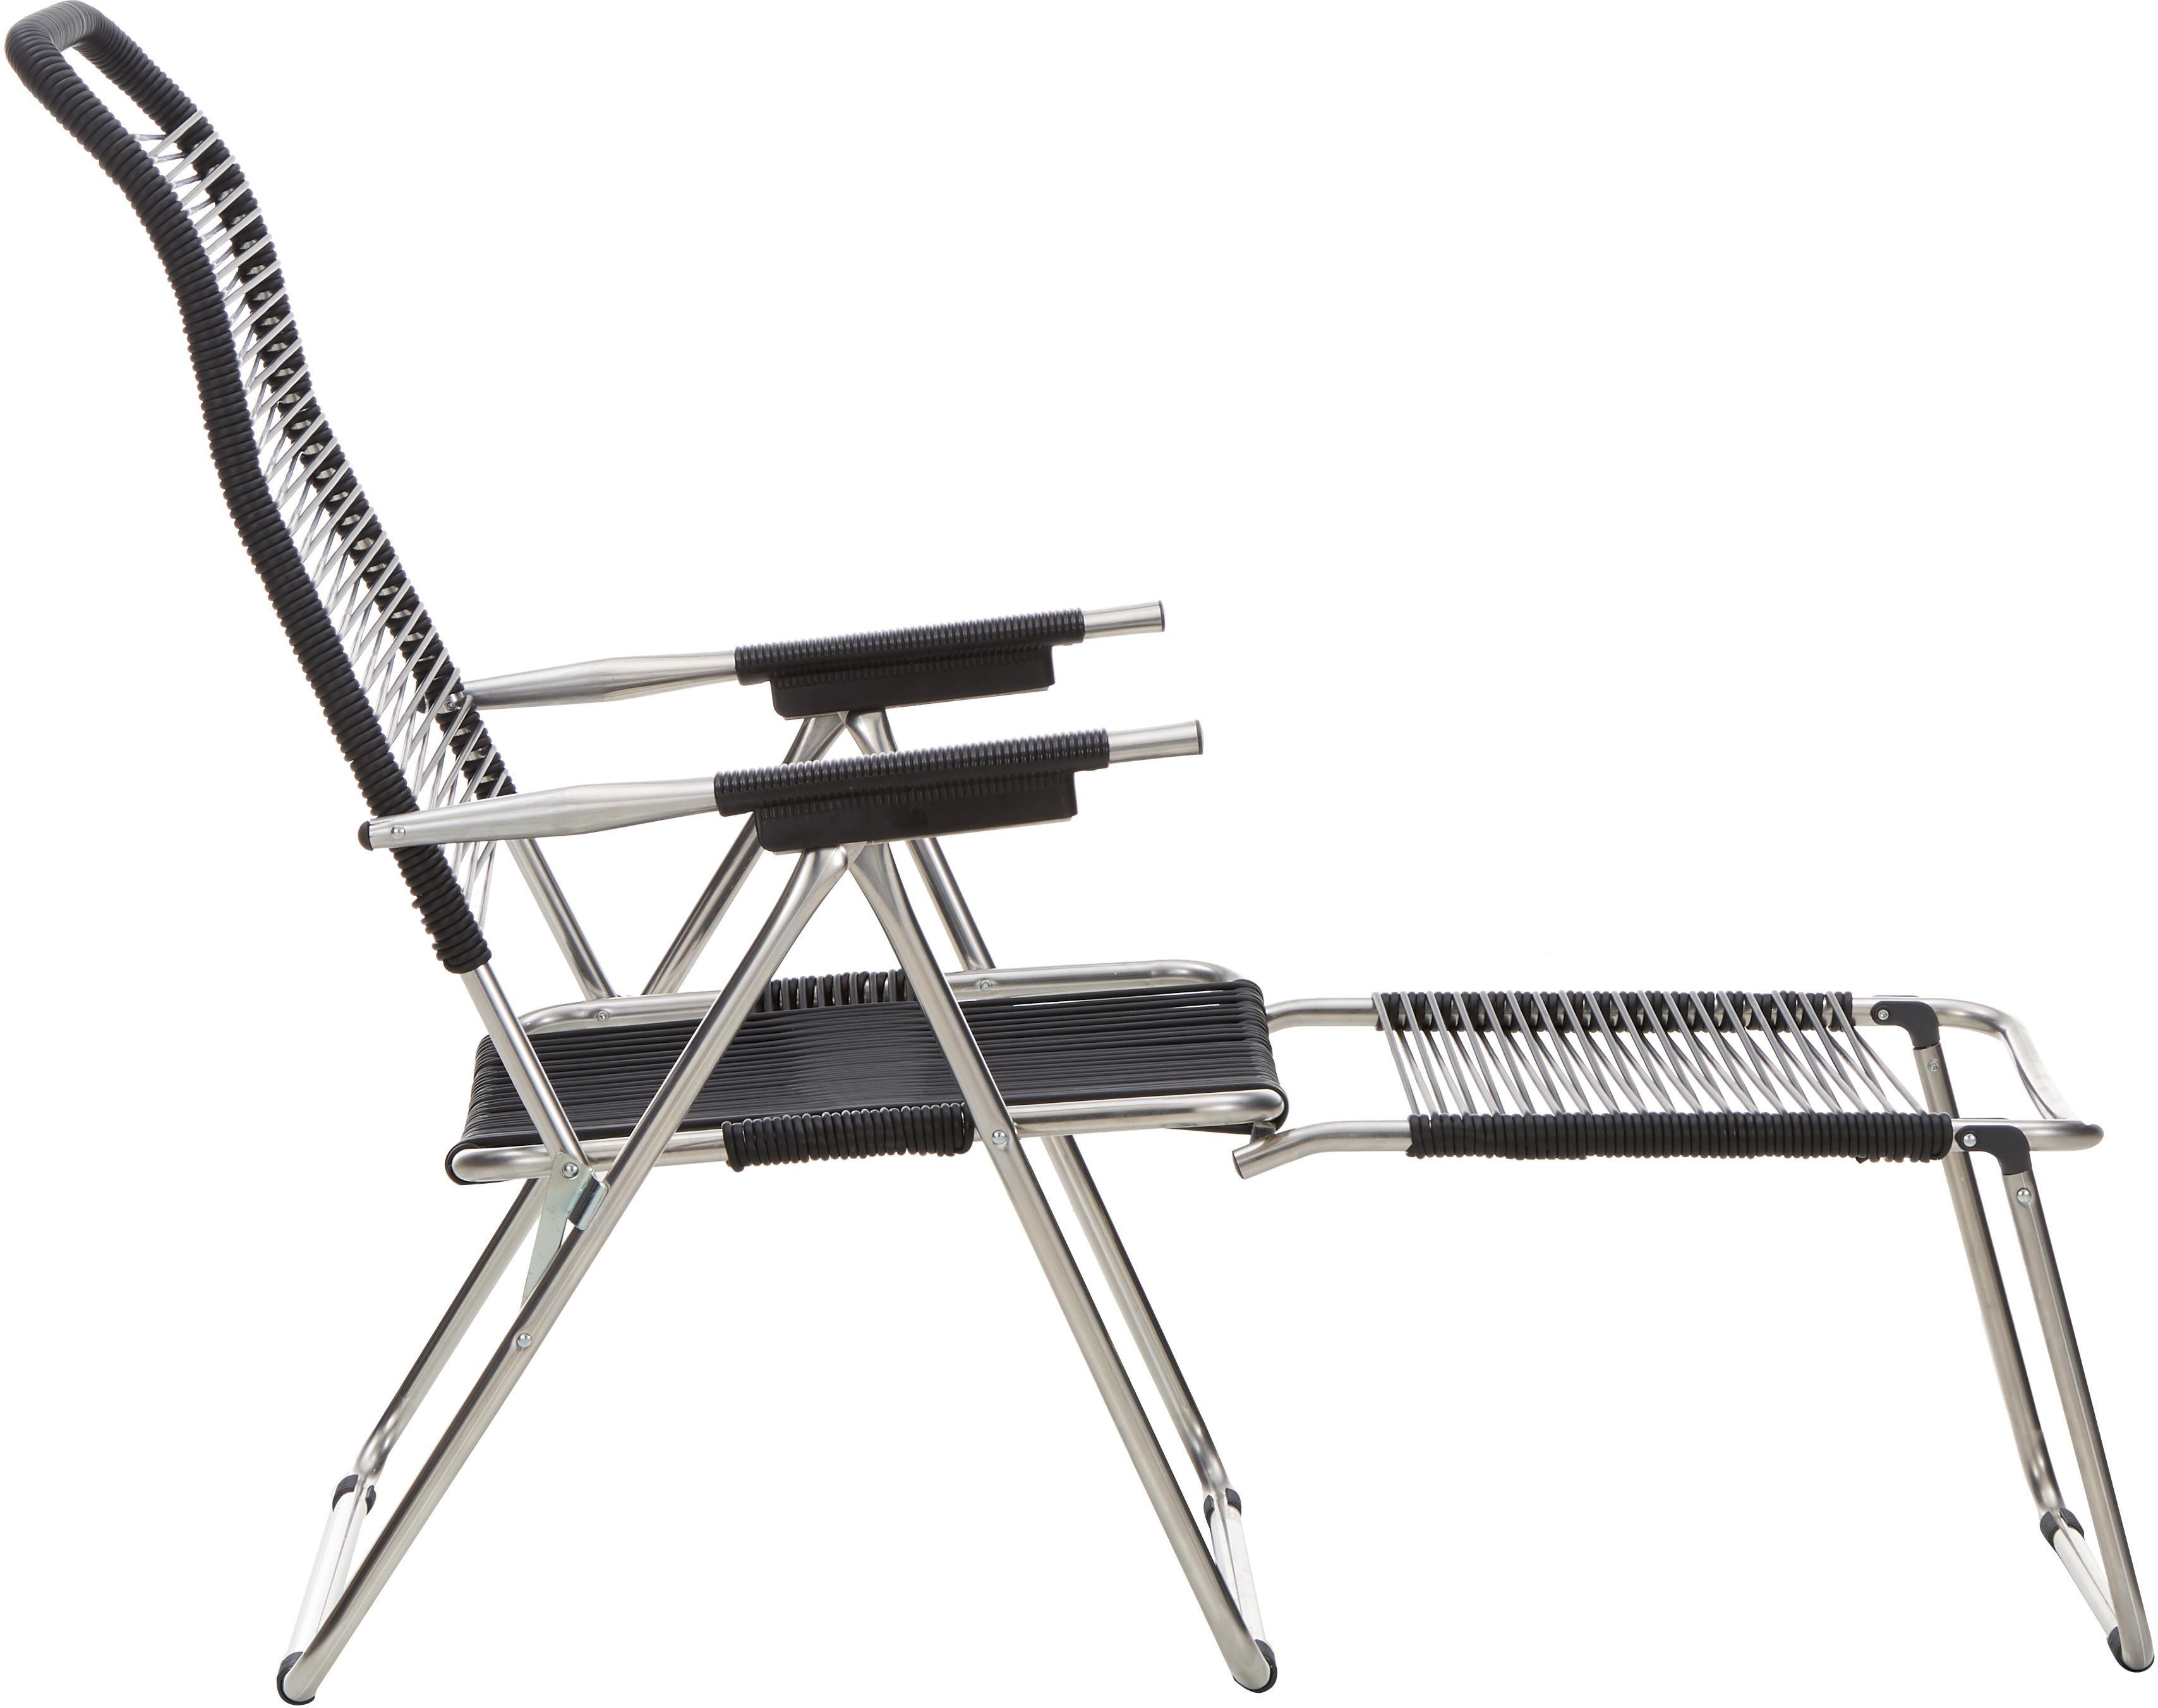 Garten-Liegestuhl Spaghetti mit Fußstütze, Gestell: Aluminium, Schwarz, B 60 x T 48 cm